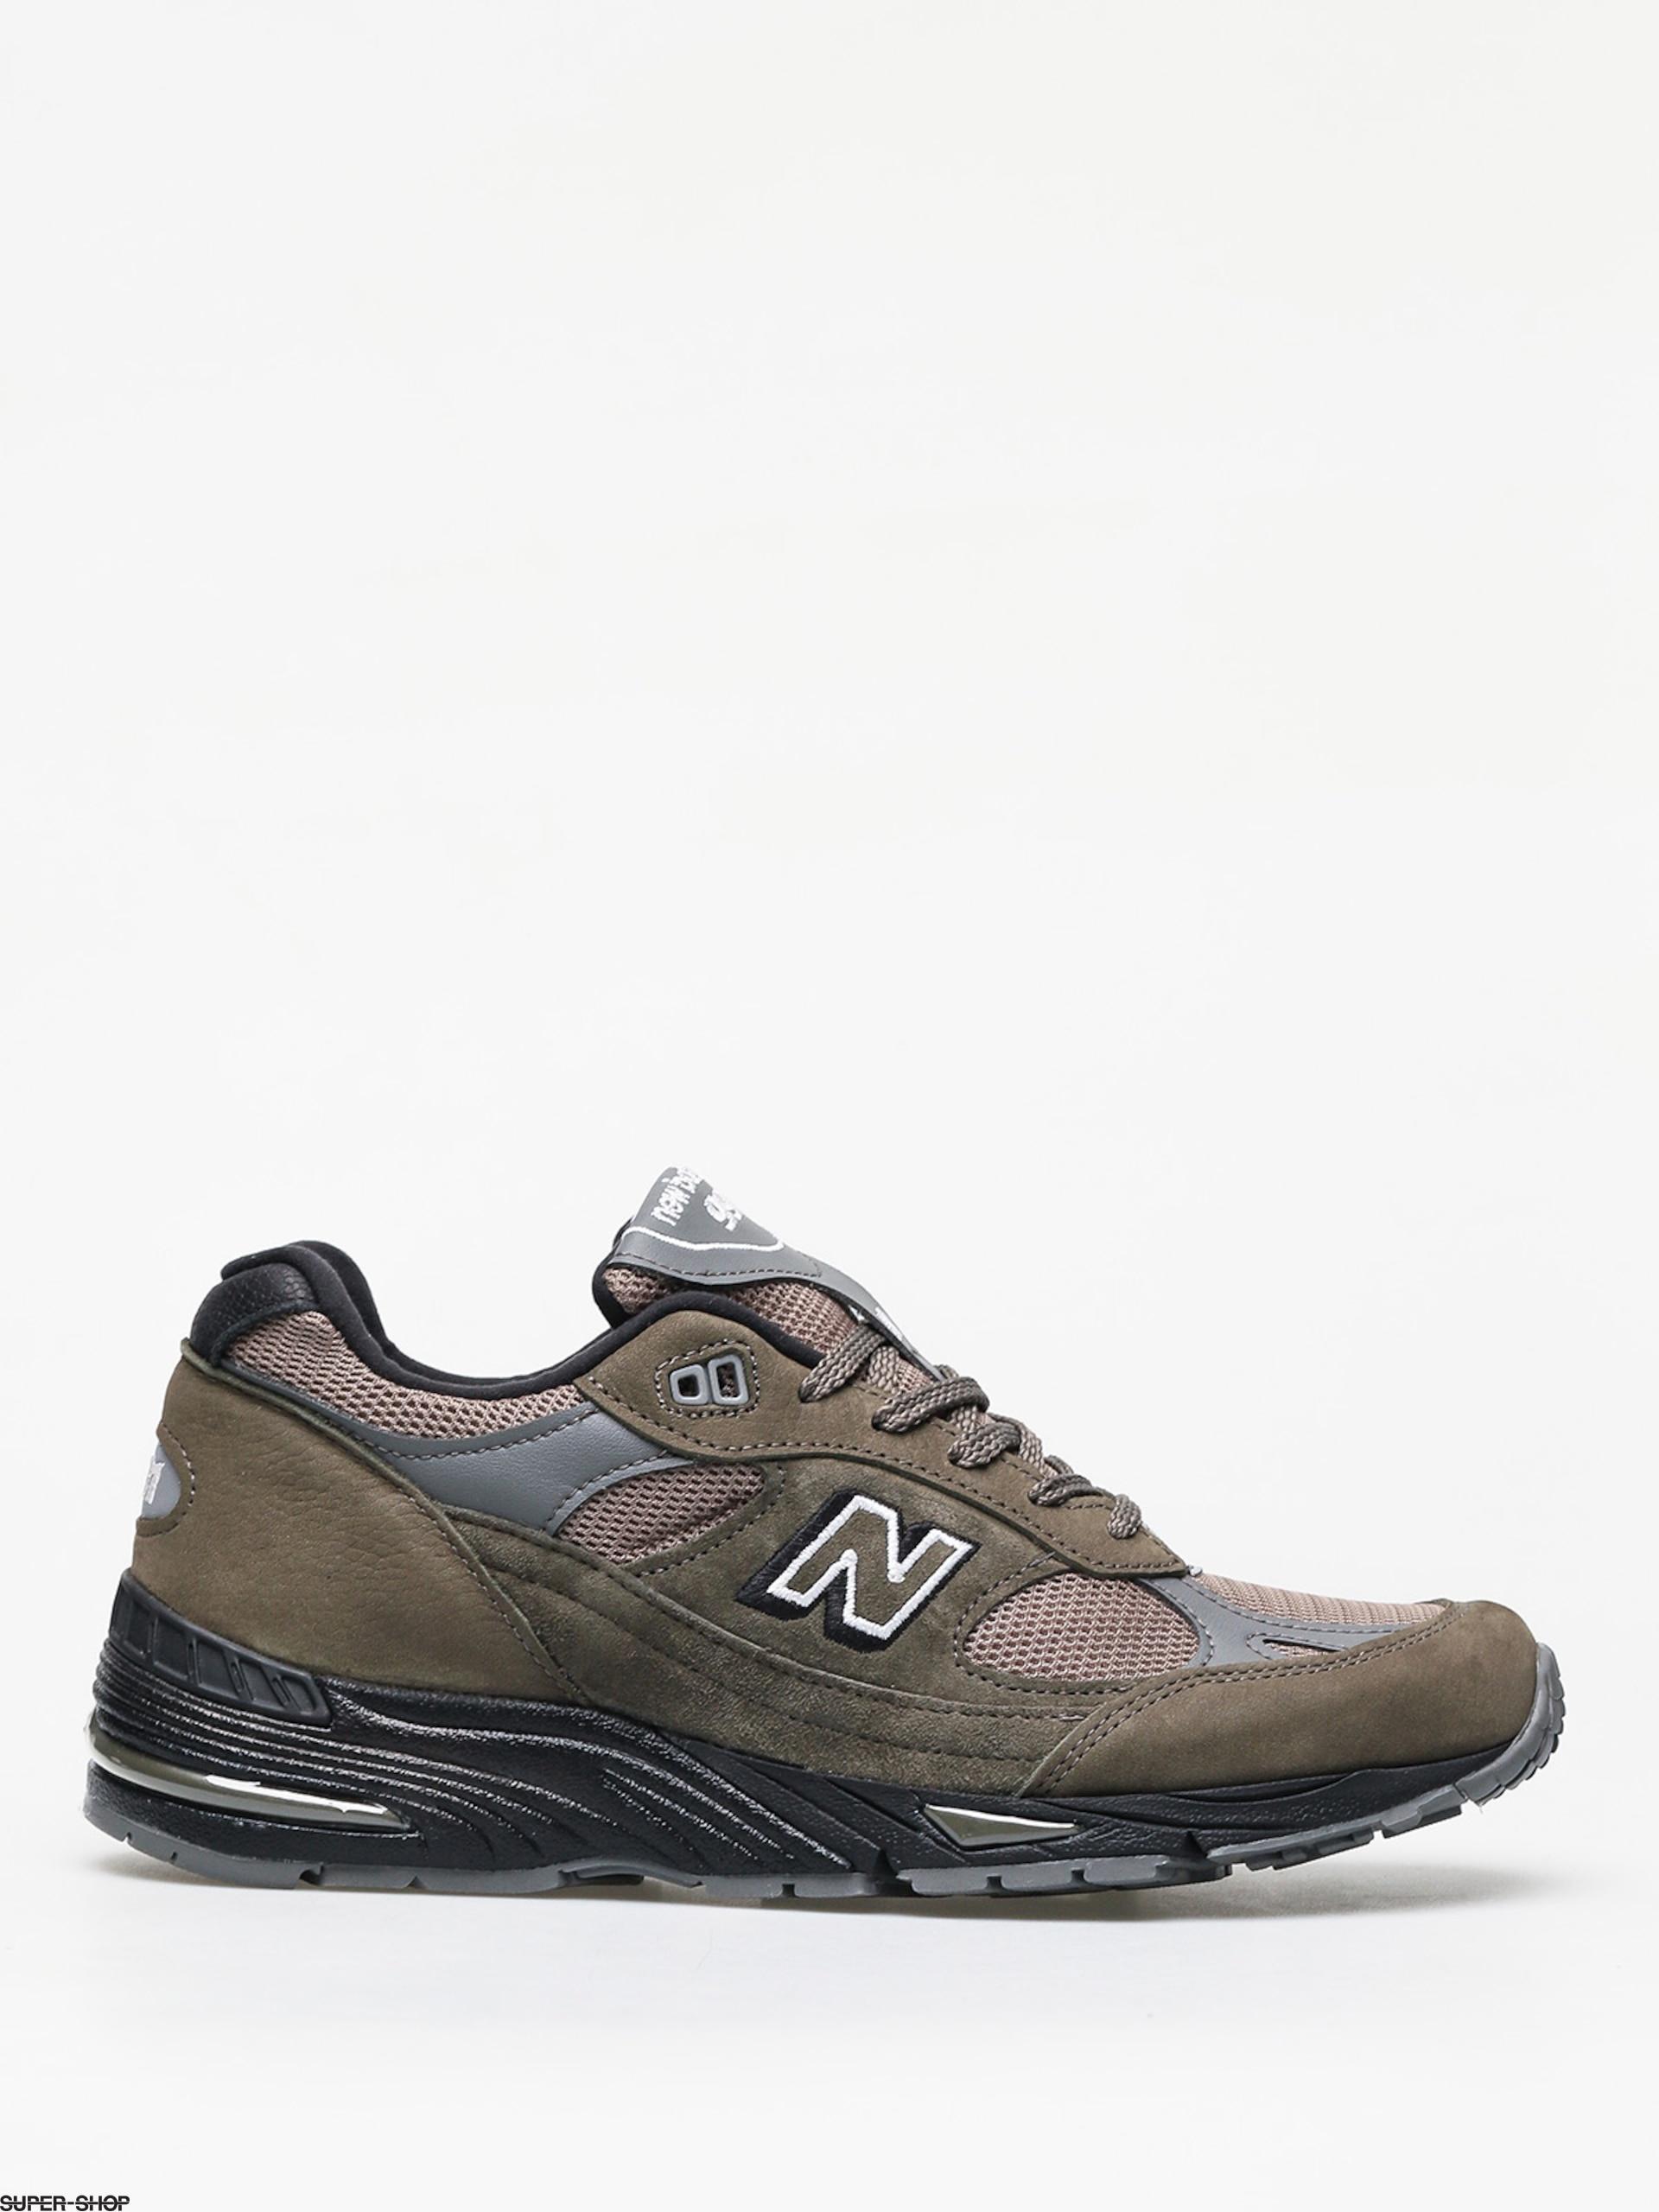 moins cher 49ccd e12c7 New Balance 991 Shoes (khaki)